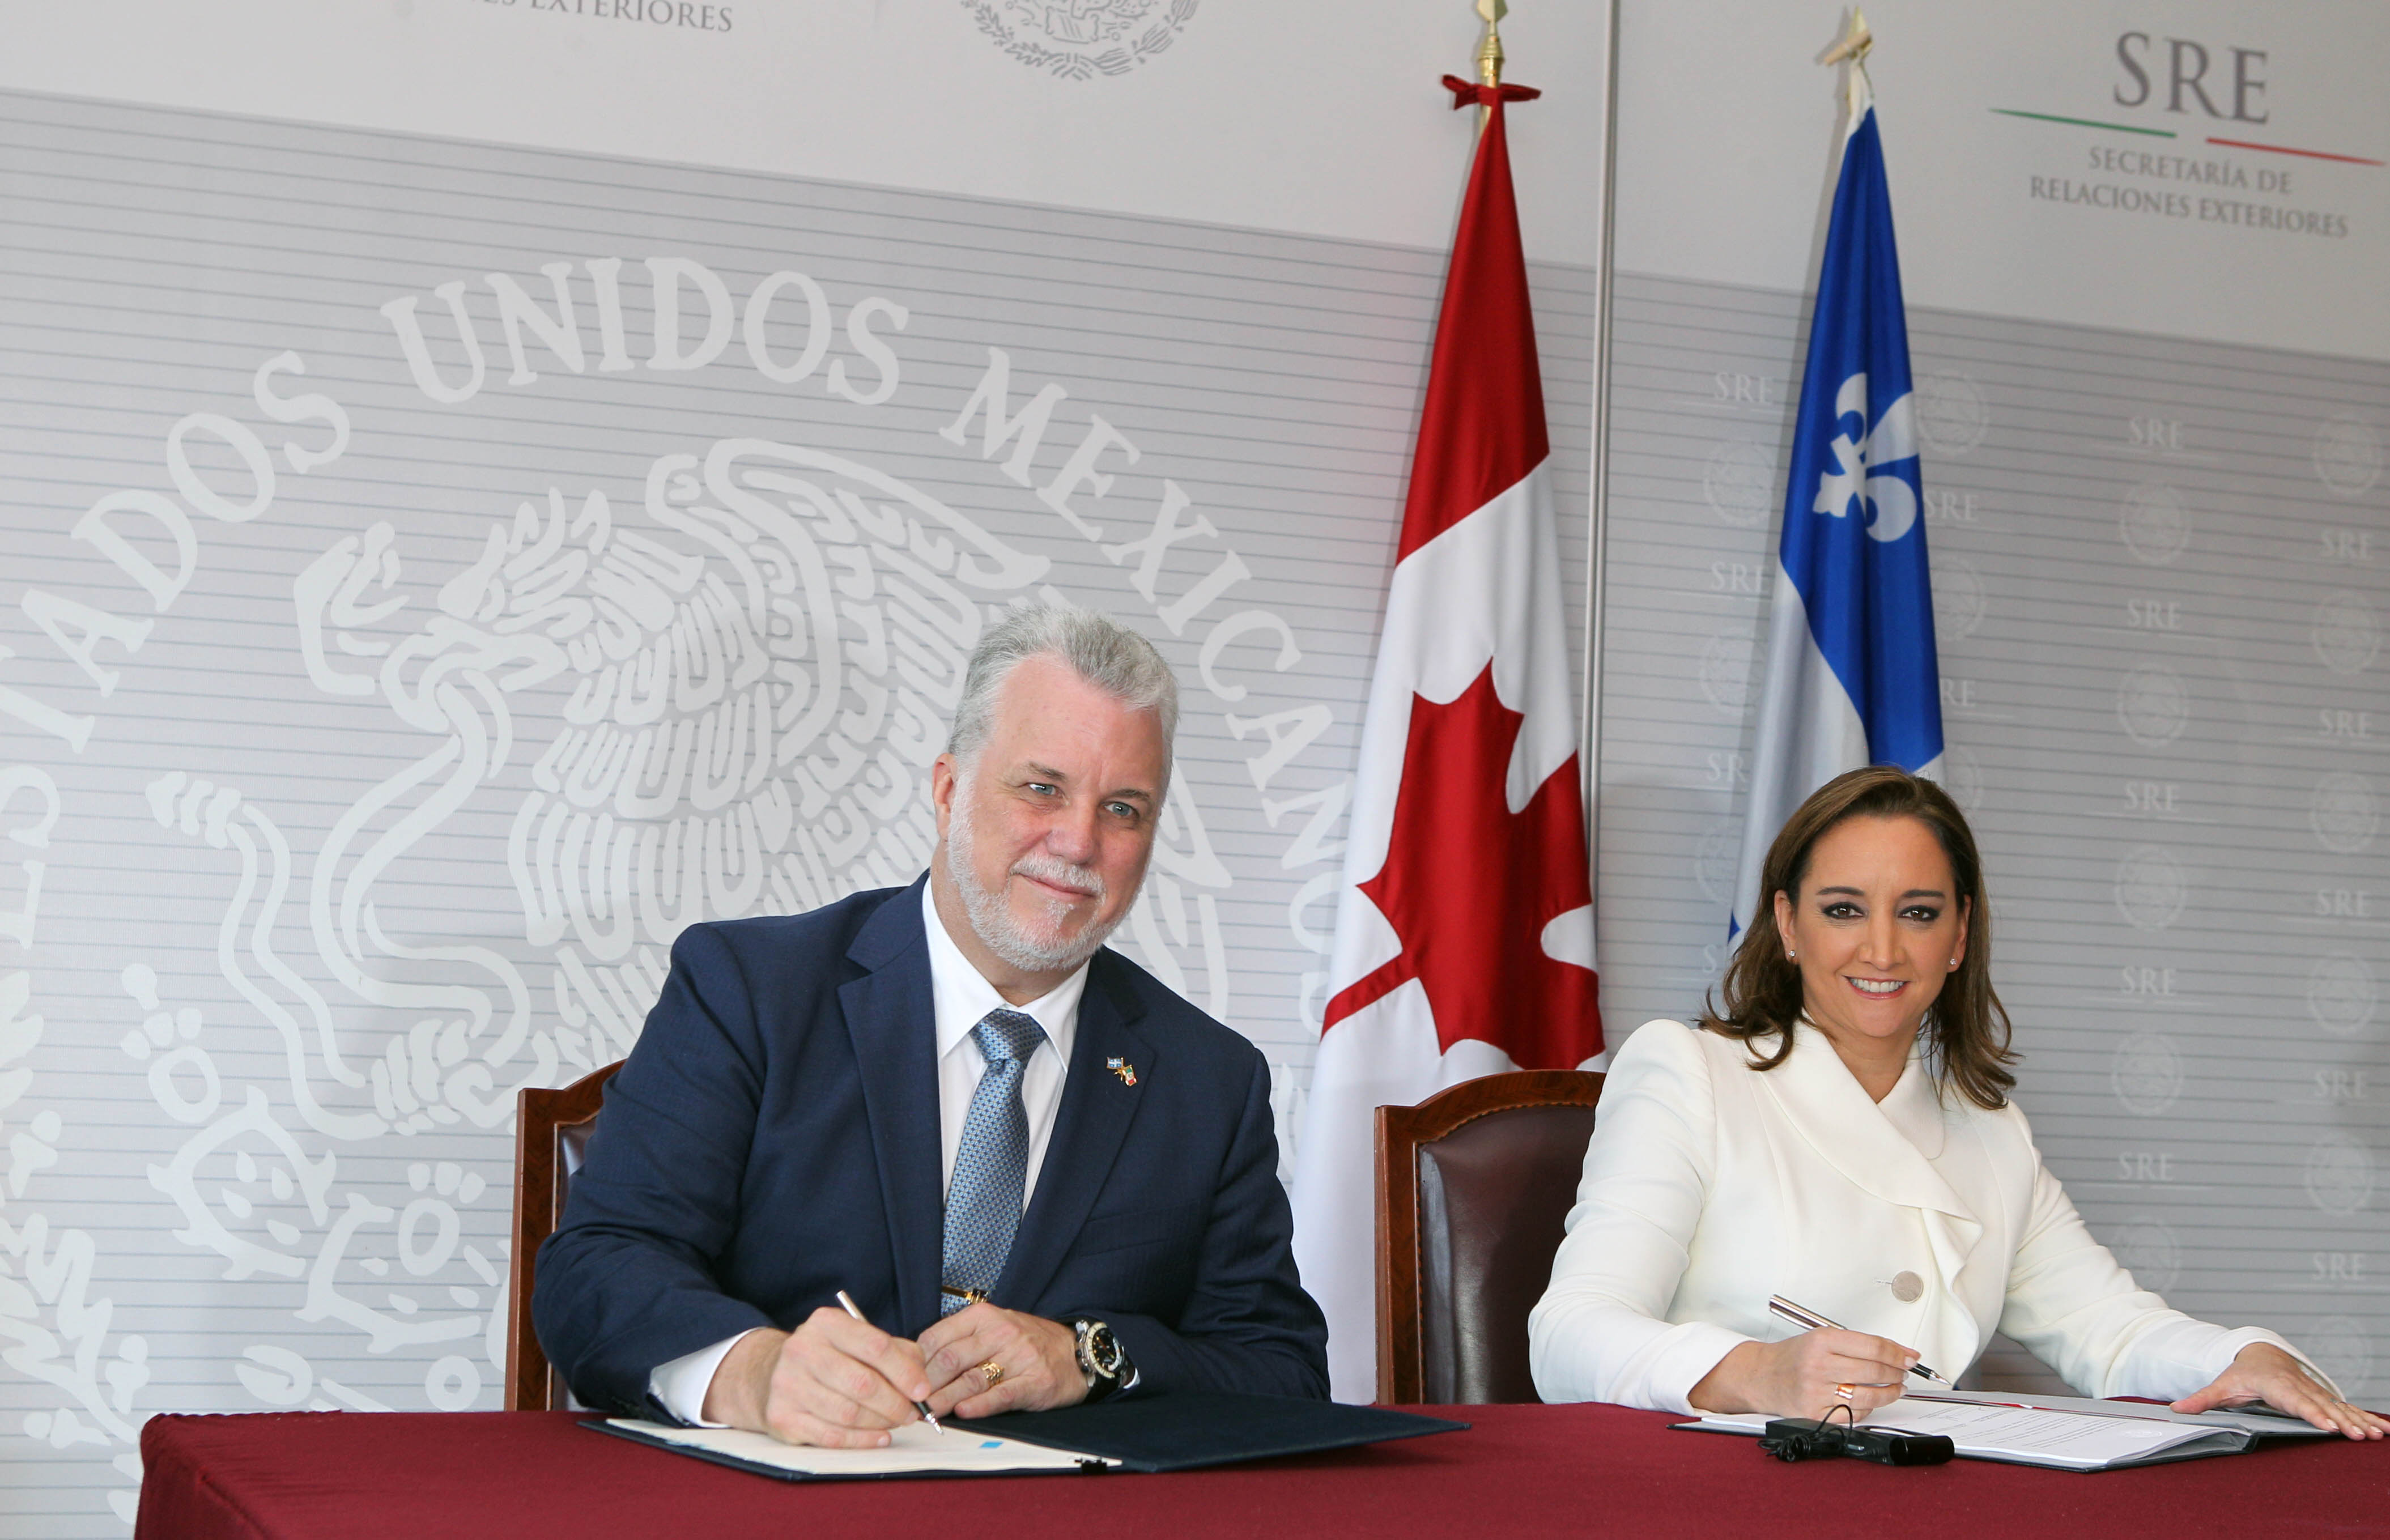 FOTO 4 Canciller Claudia Ruiz Massieu con el Primer Ministro de la Provincia de Quebec  Philippe Couillard  2 .jpg